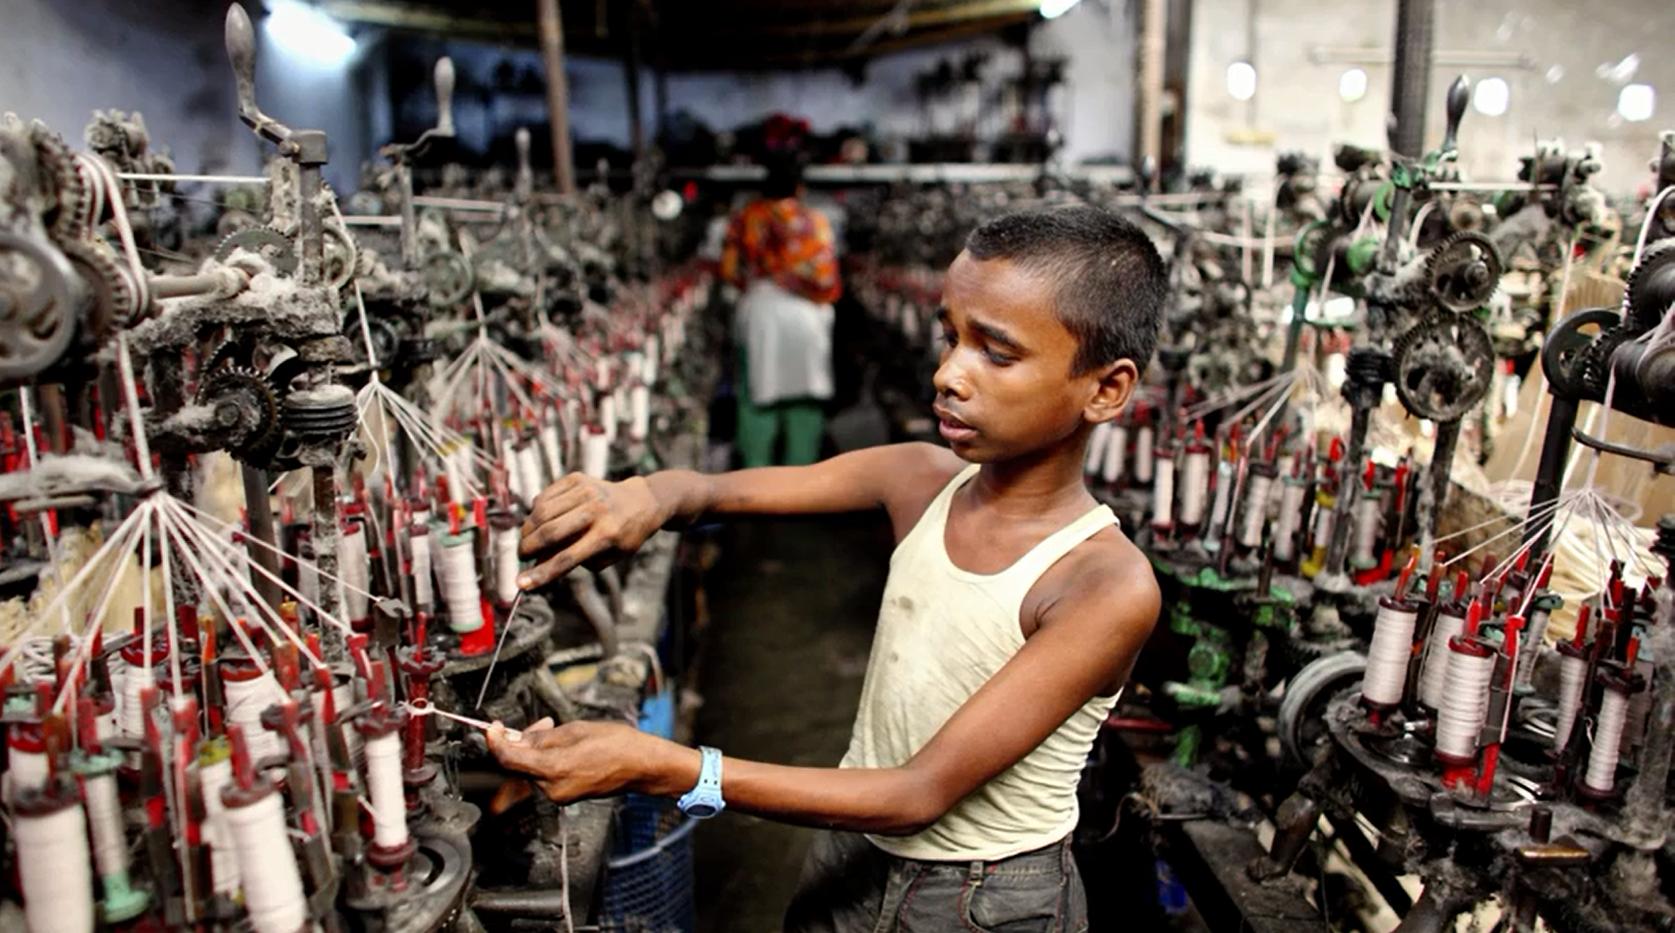 kinderarbeid in kledingfabriek